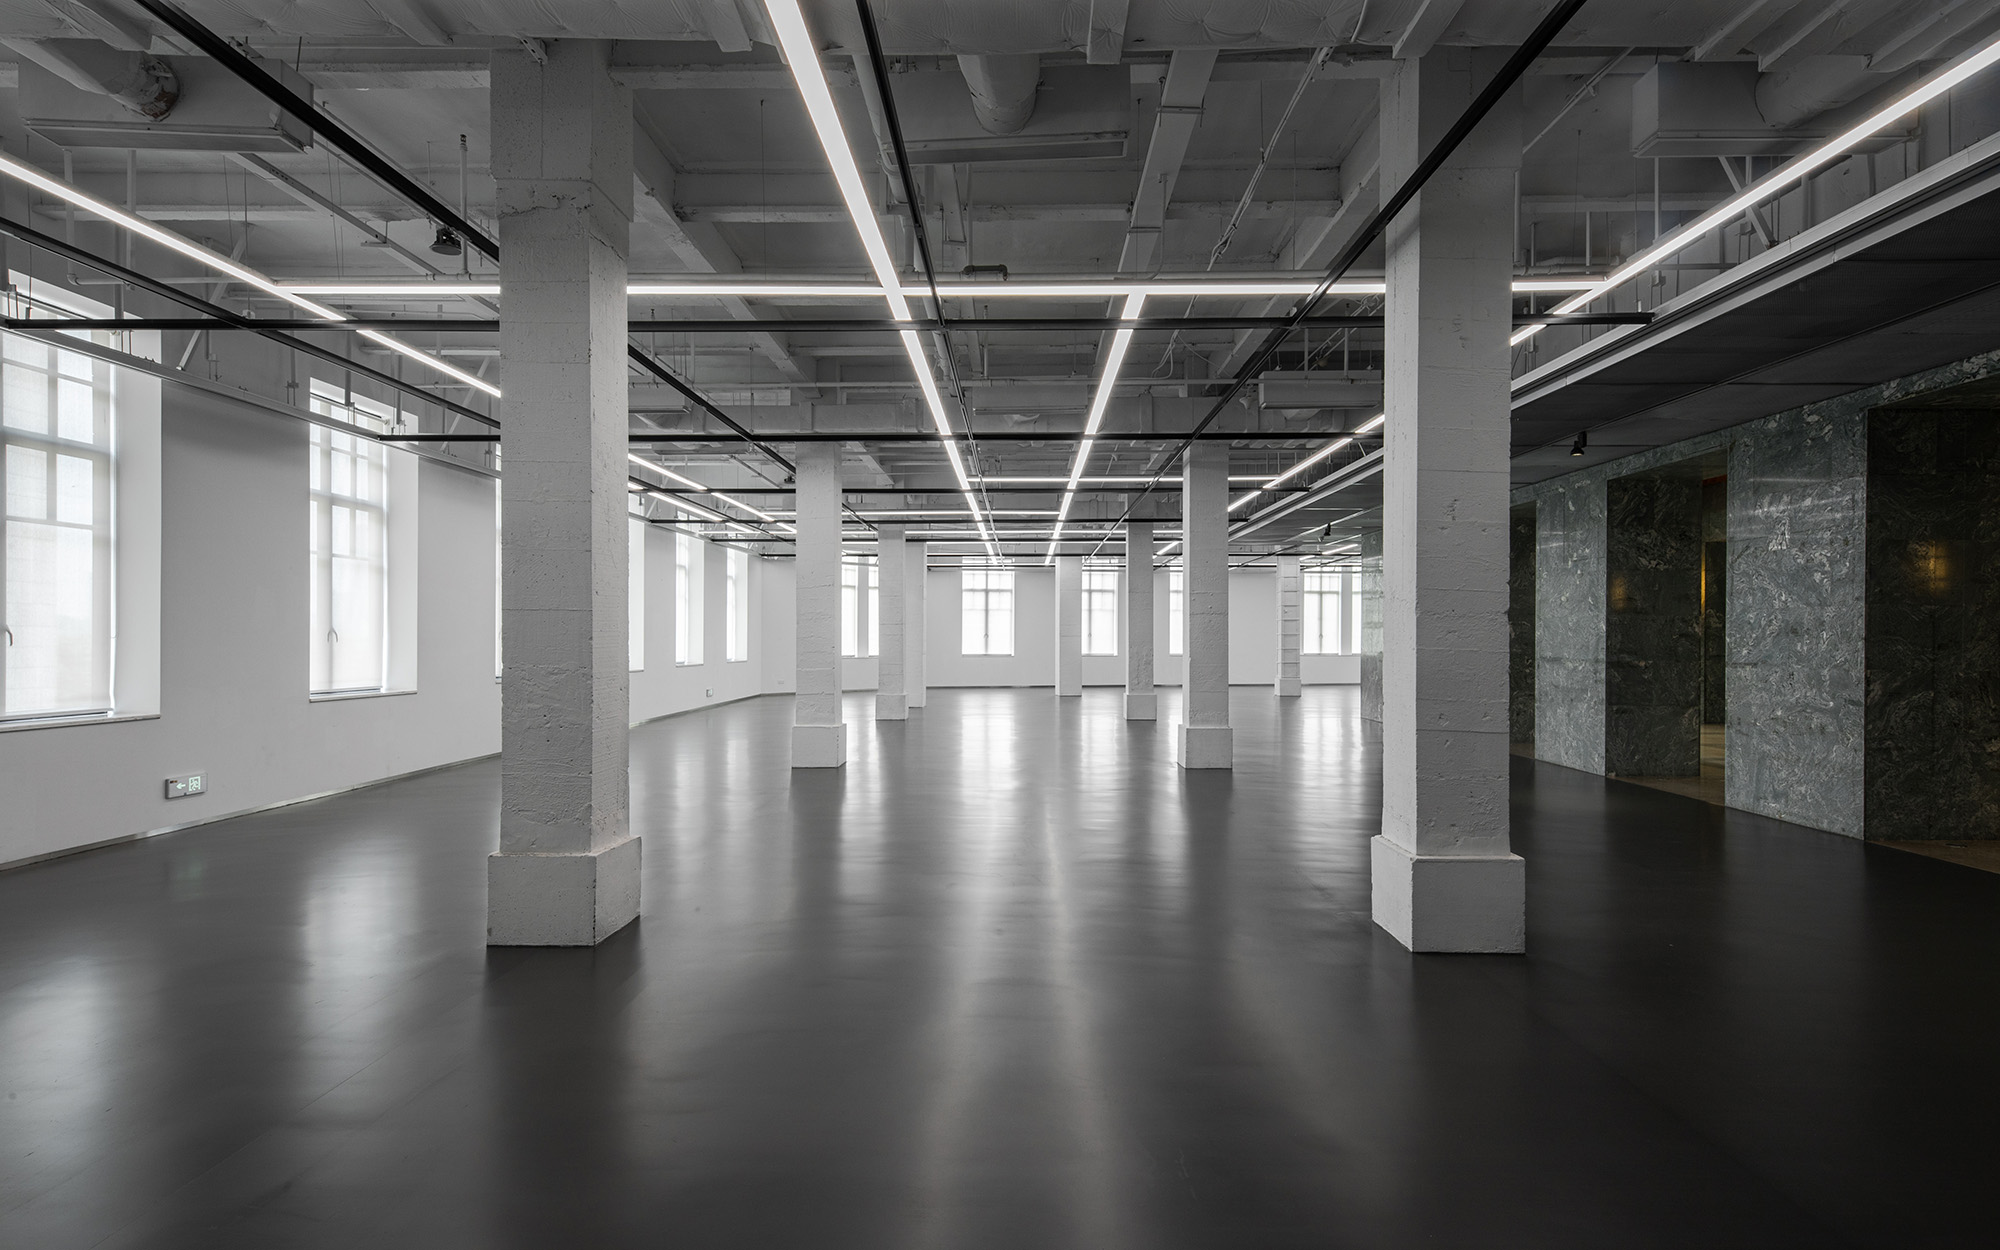 Exhibition Hall